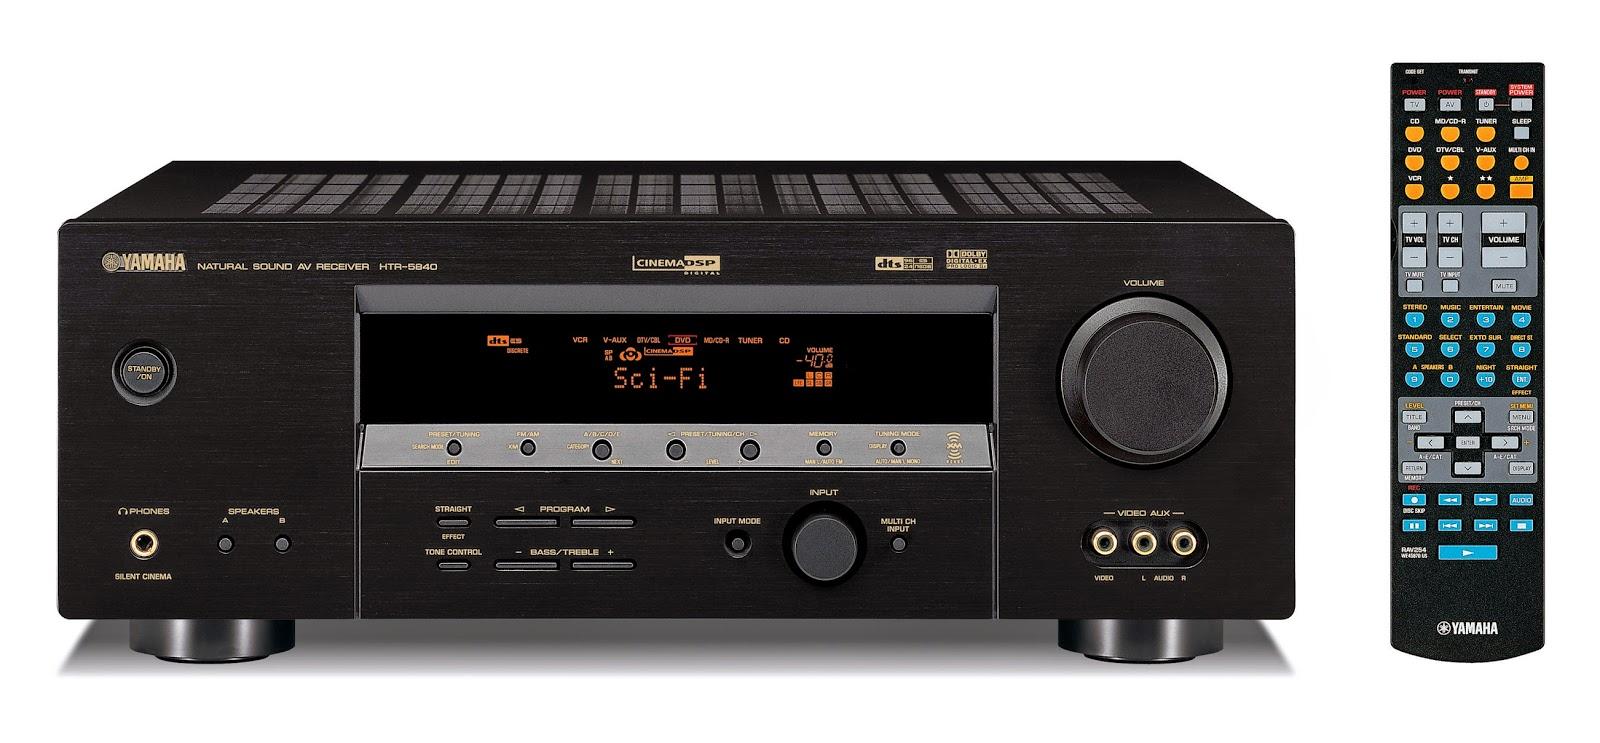 Yamaha Av Receiver South Africa